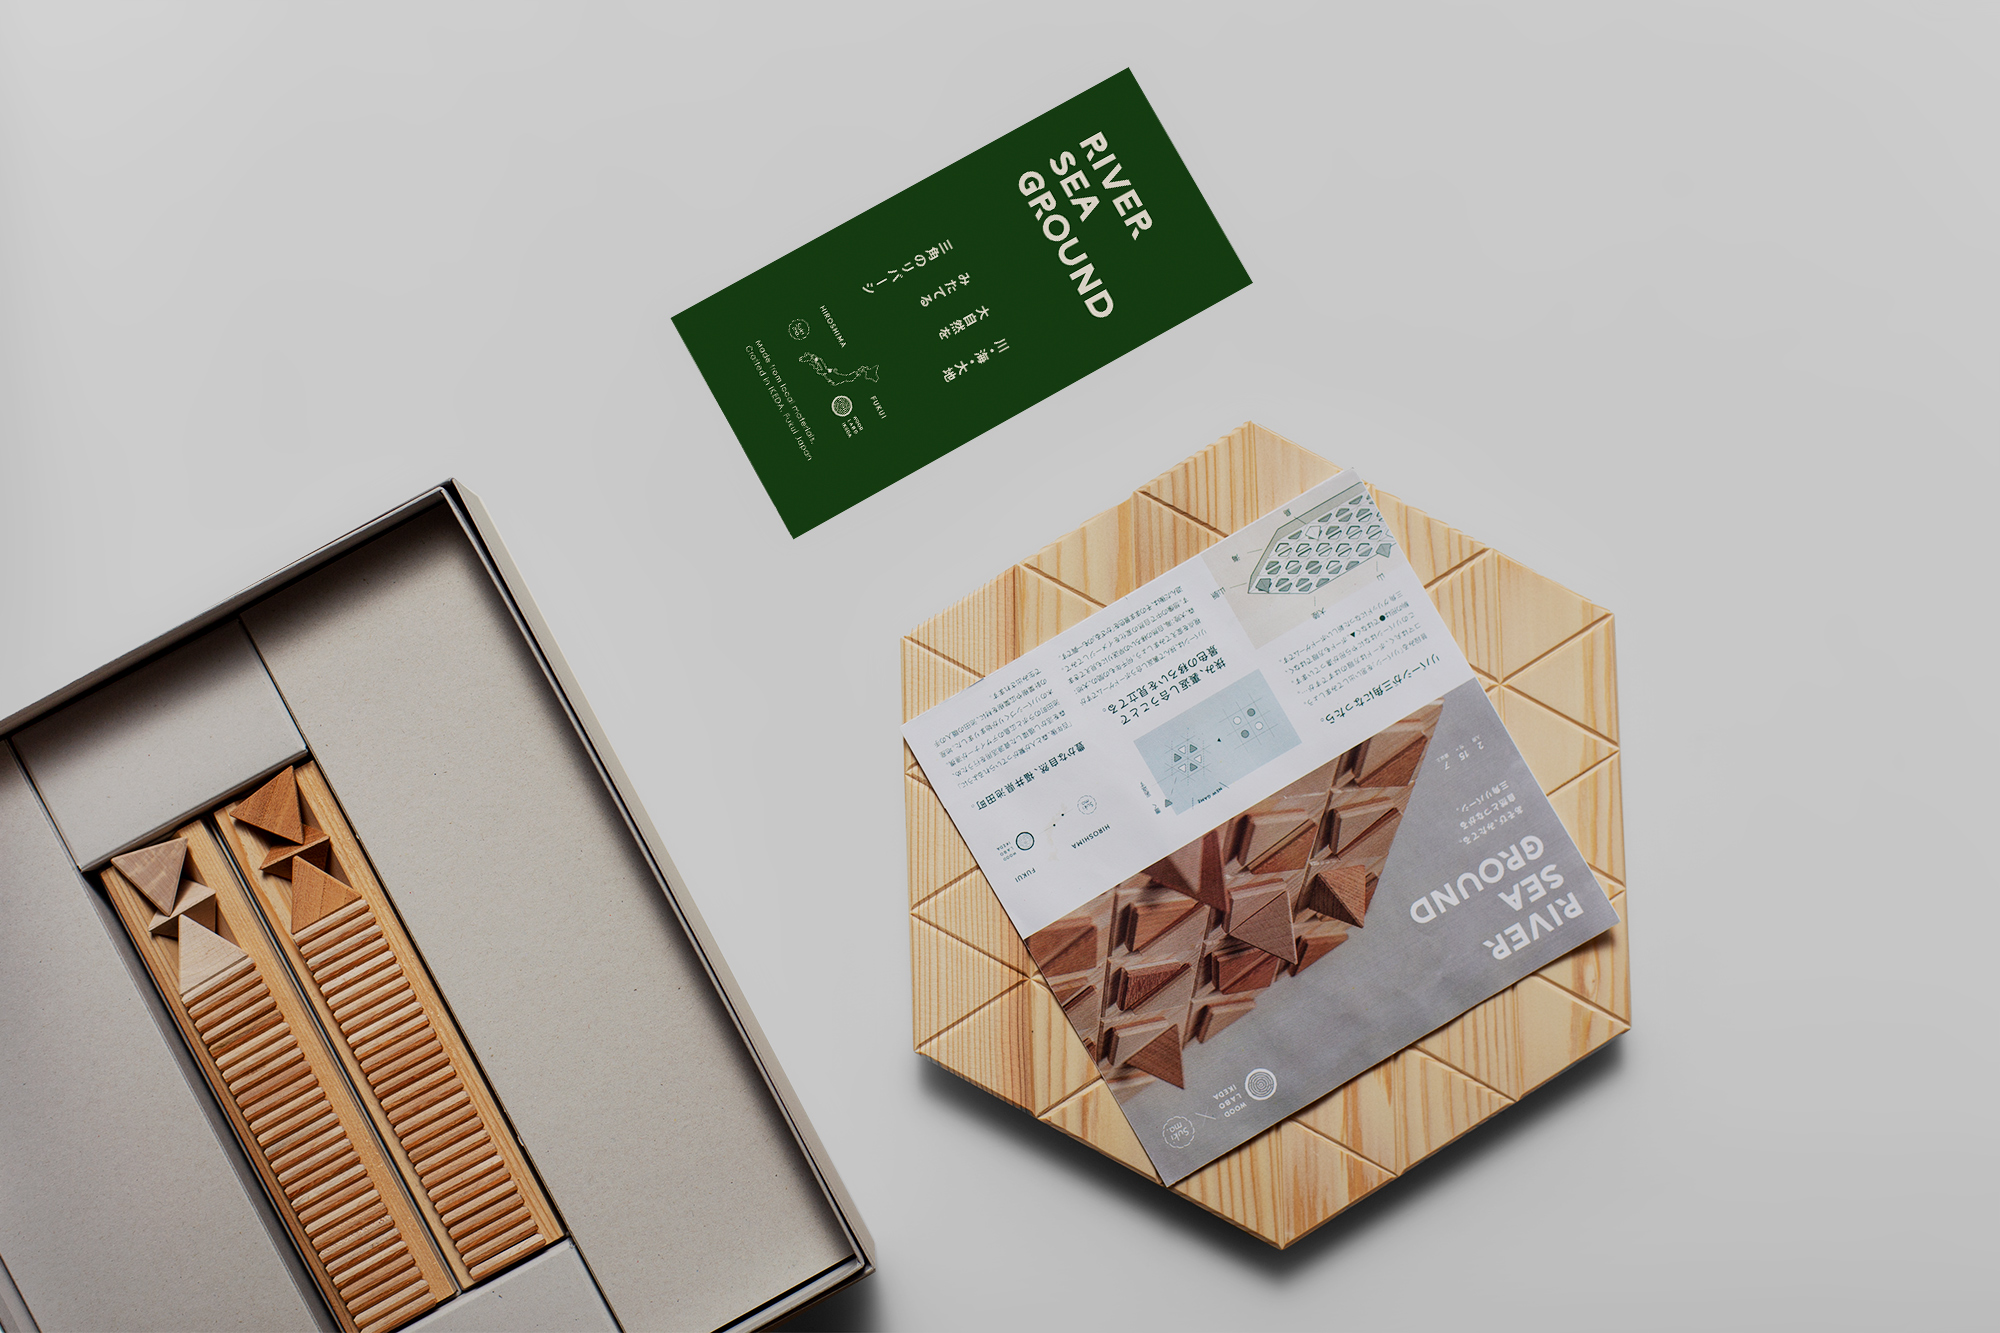 sukima.の三角のオセロ/リバーシ/sukima RIVER SEA GROUND / リバーシーグラウンド / おしゃれ/ かわいい/ デザインおもちゃ